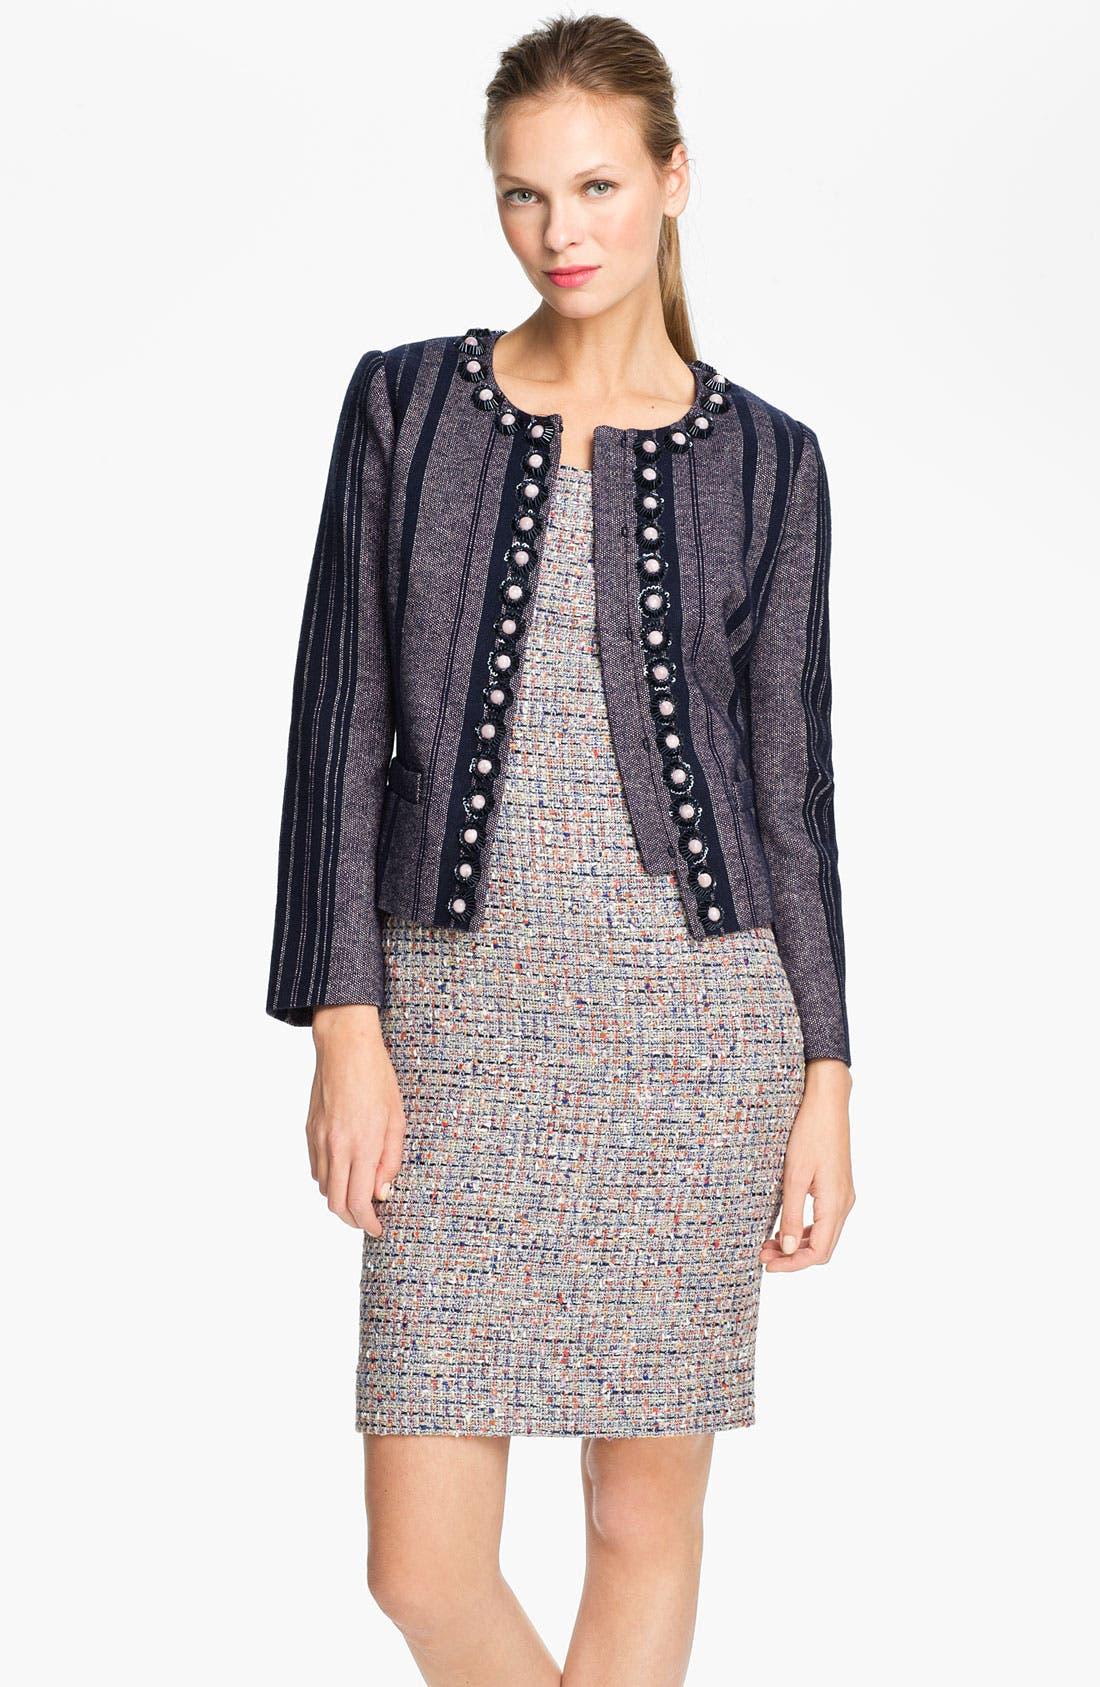 Alternate Image 1 Selected - Tory Burch 'Eliza' Embellished Jacket